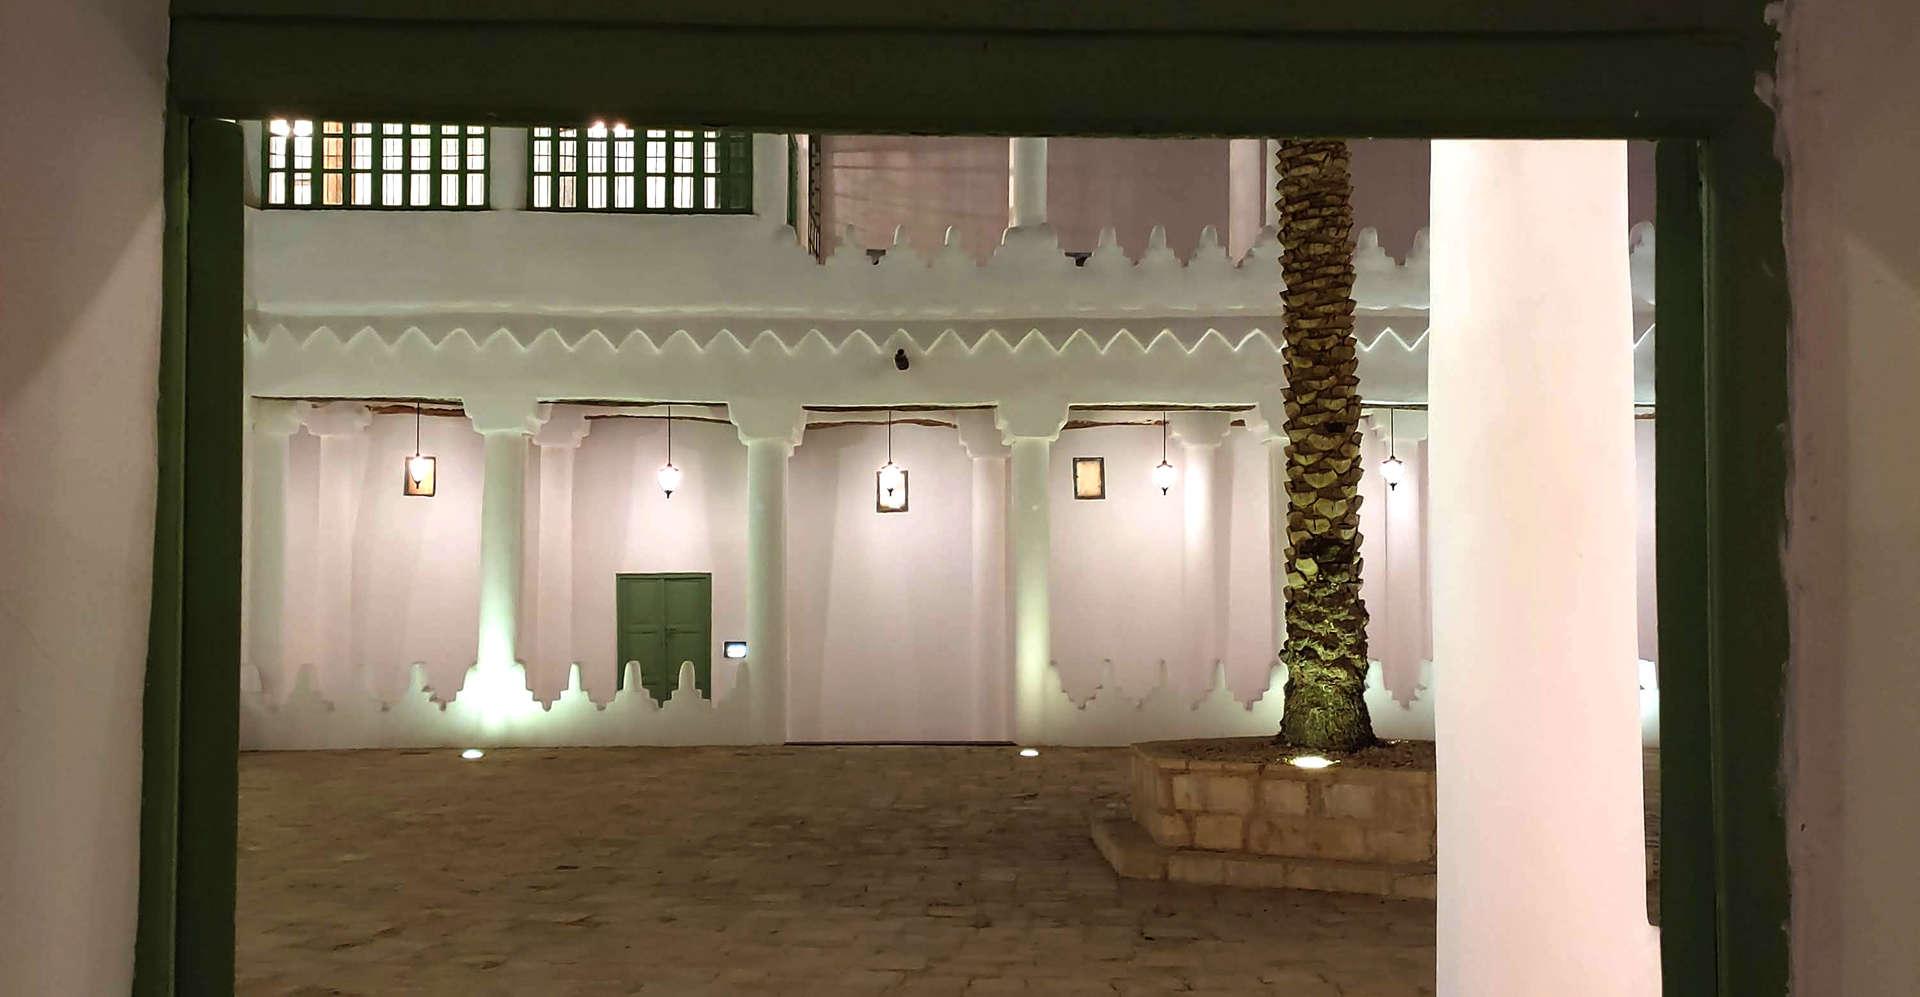 Saudia Arabia PAGANE uniques (9).jpg